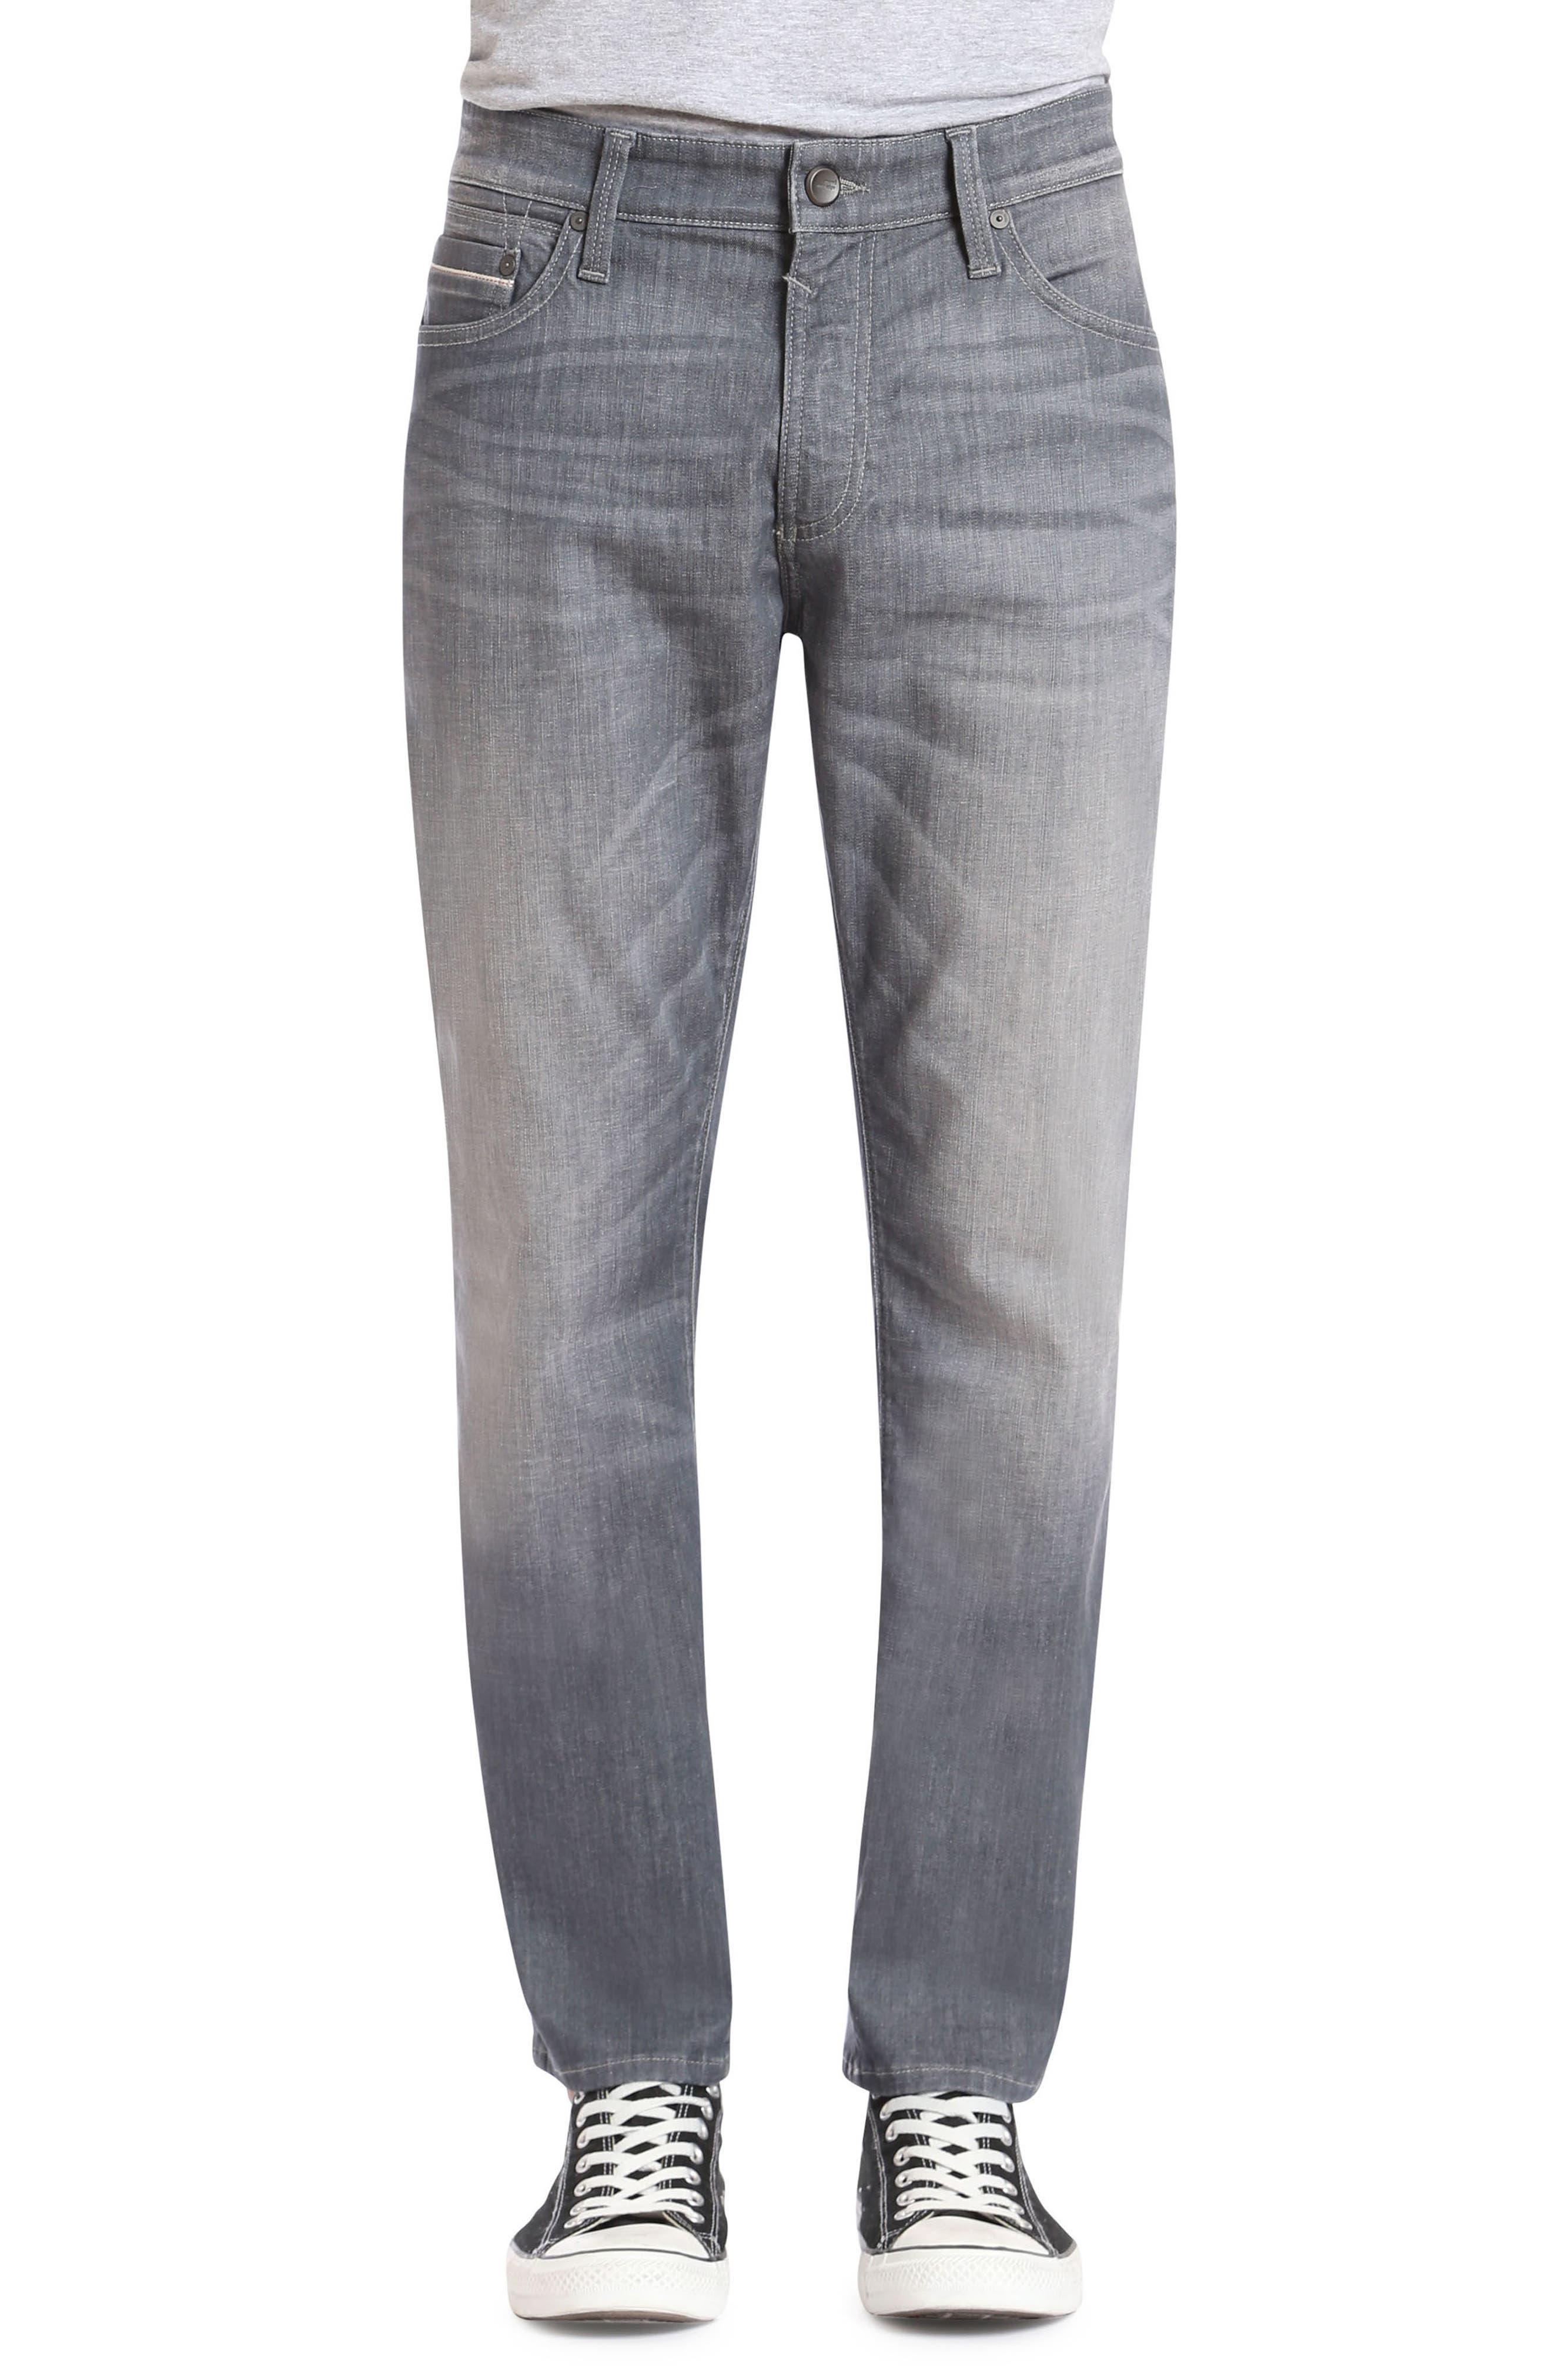 Marcus Slim Straight Leg Jeans,                             Main thumbnail 1, color,                             020